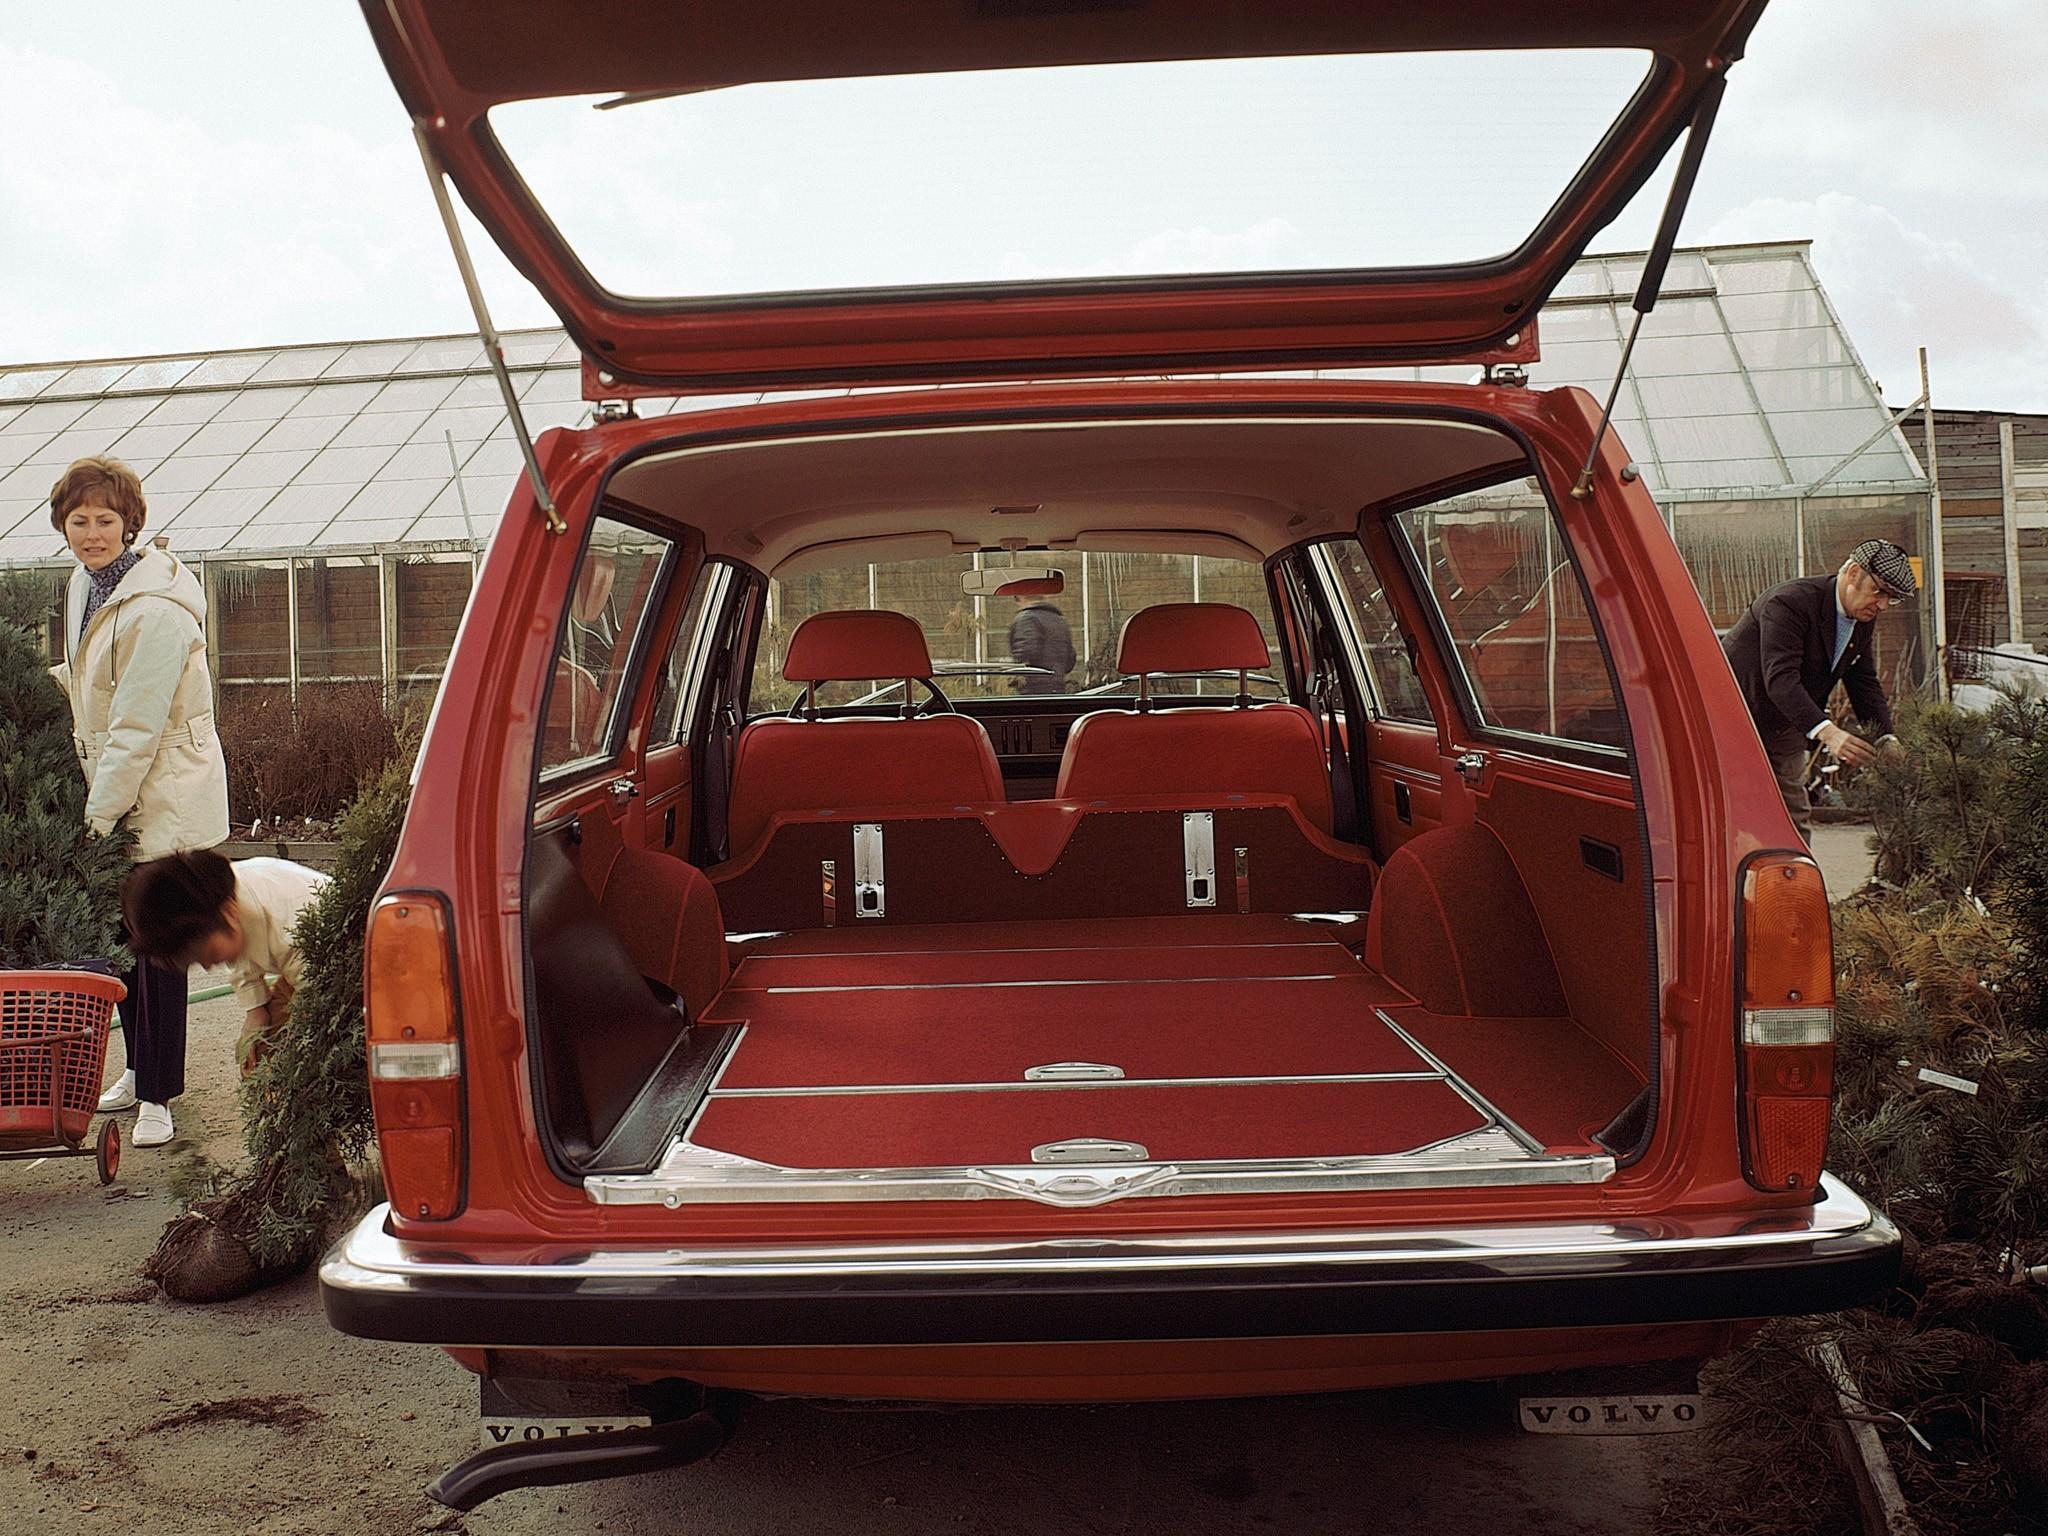 VOLVO 145 - 1967, 1968, 1969, 1970, 1971, 1972, 1973, 1974 - autoevolution